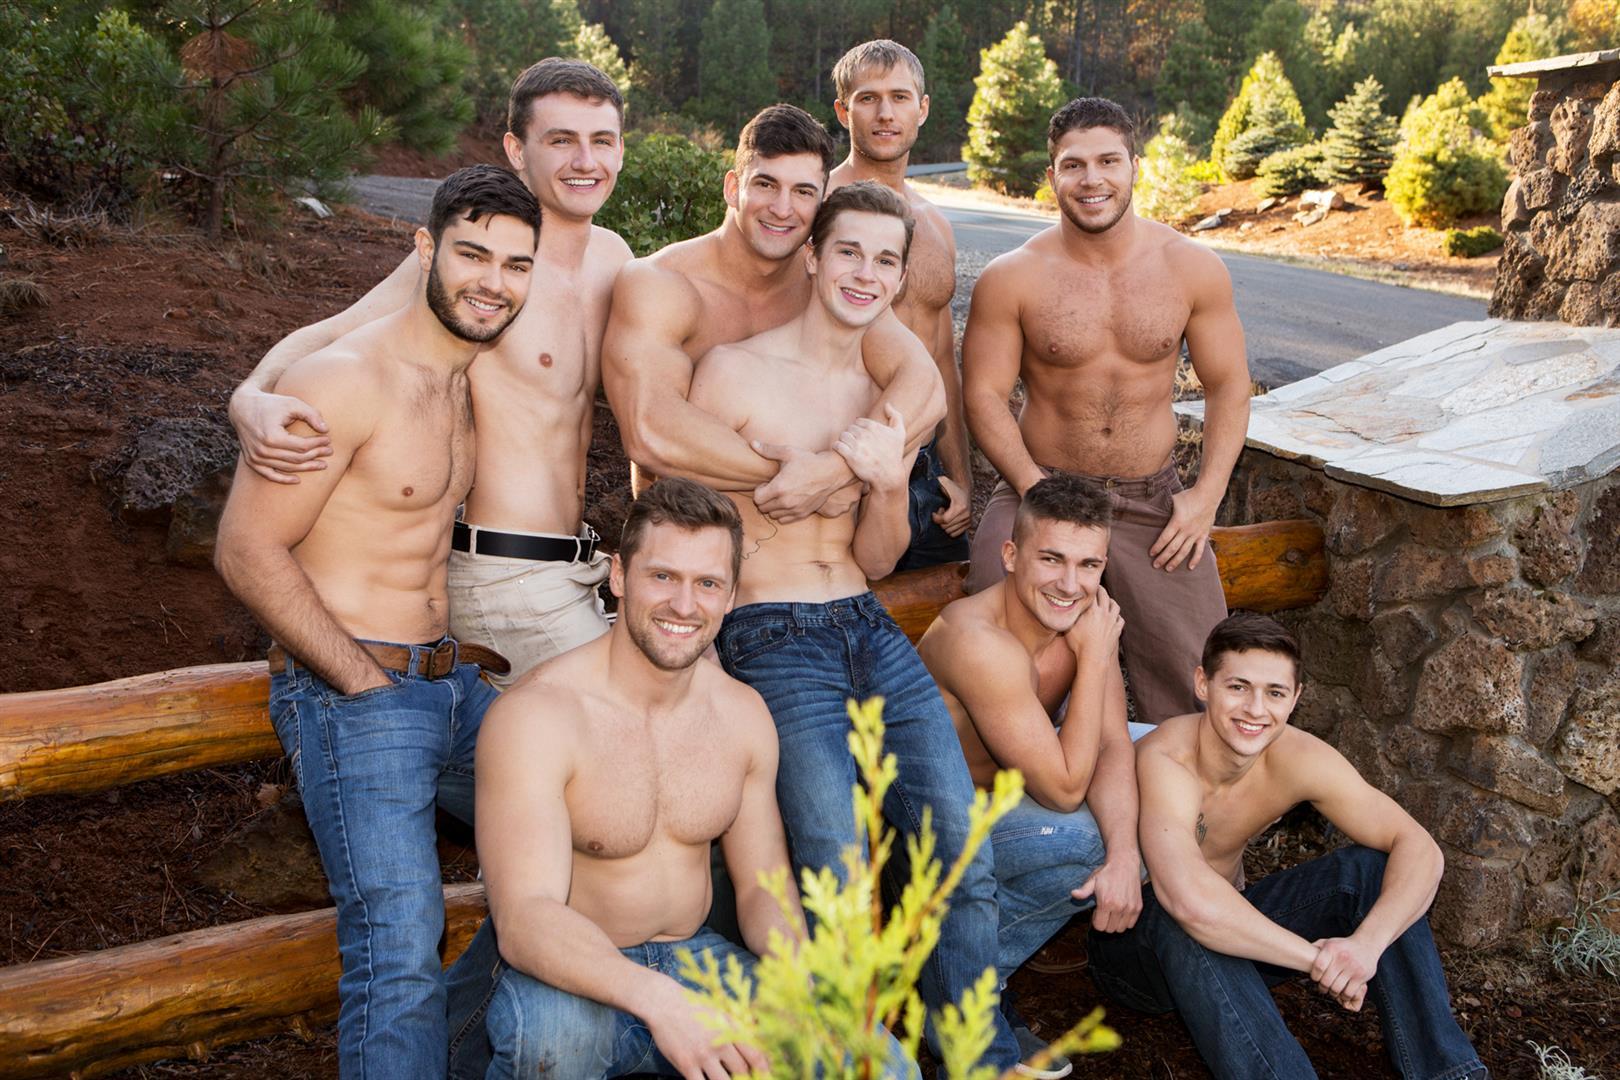 Sean-Cody-Winter-Getaway-Day-5-Big-Dick-Hunks-Fucking-Bareback-Amateur-Gay-Porn-04 Sean Cody Takes The Boys On A 8-Day Bareback Winter Getaway